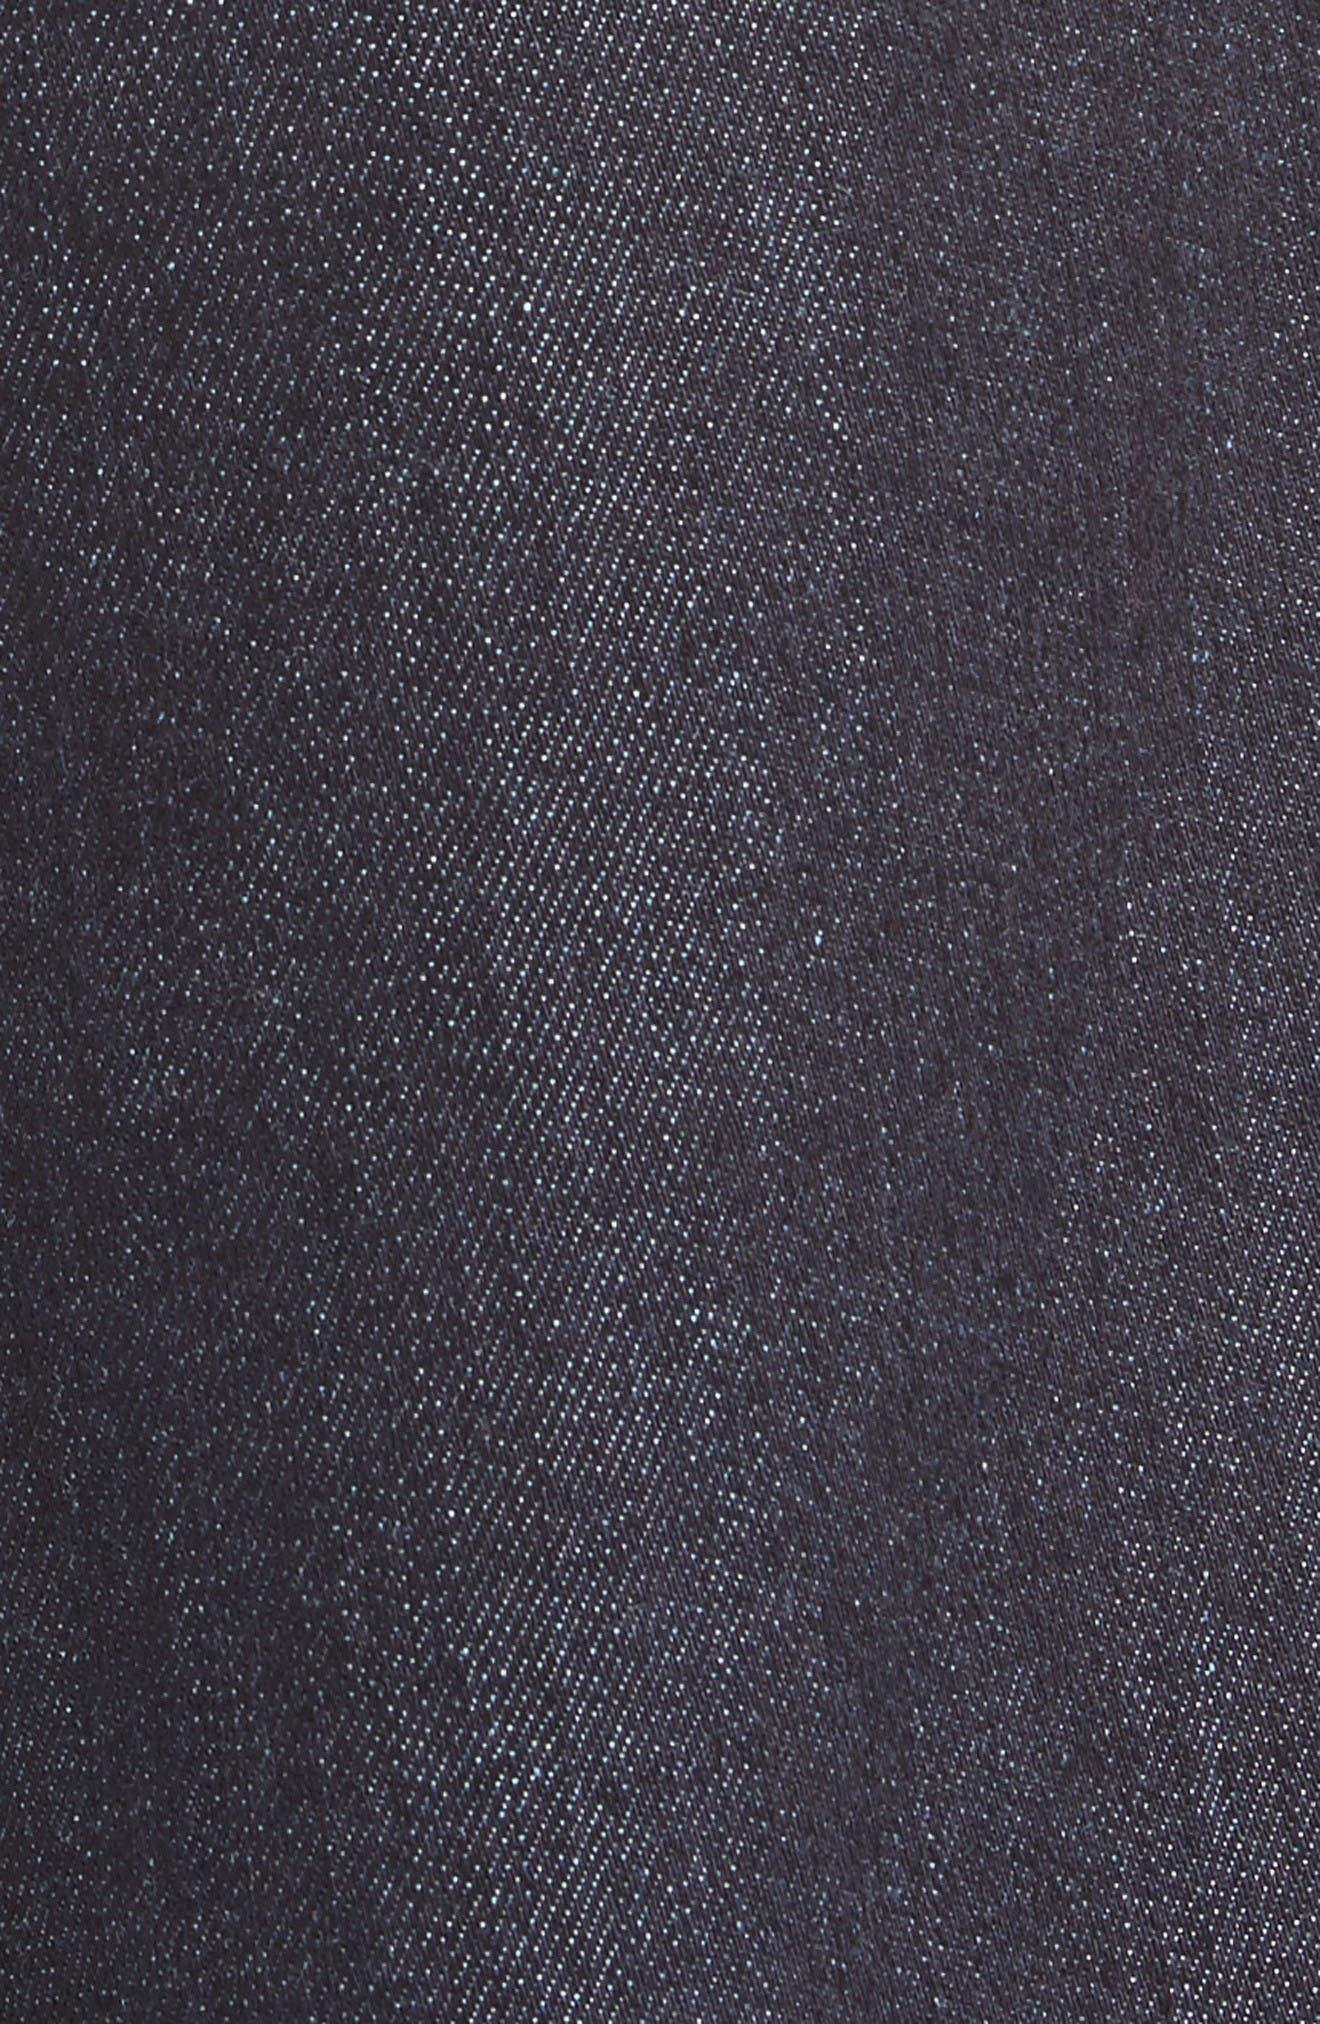 Sam High Waist Culotte Jeans,                             Alternate thumbnail 6, color,                             Dark Denim